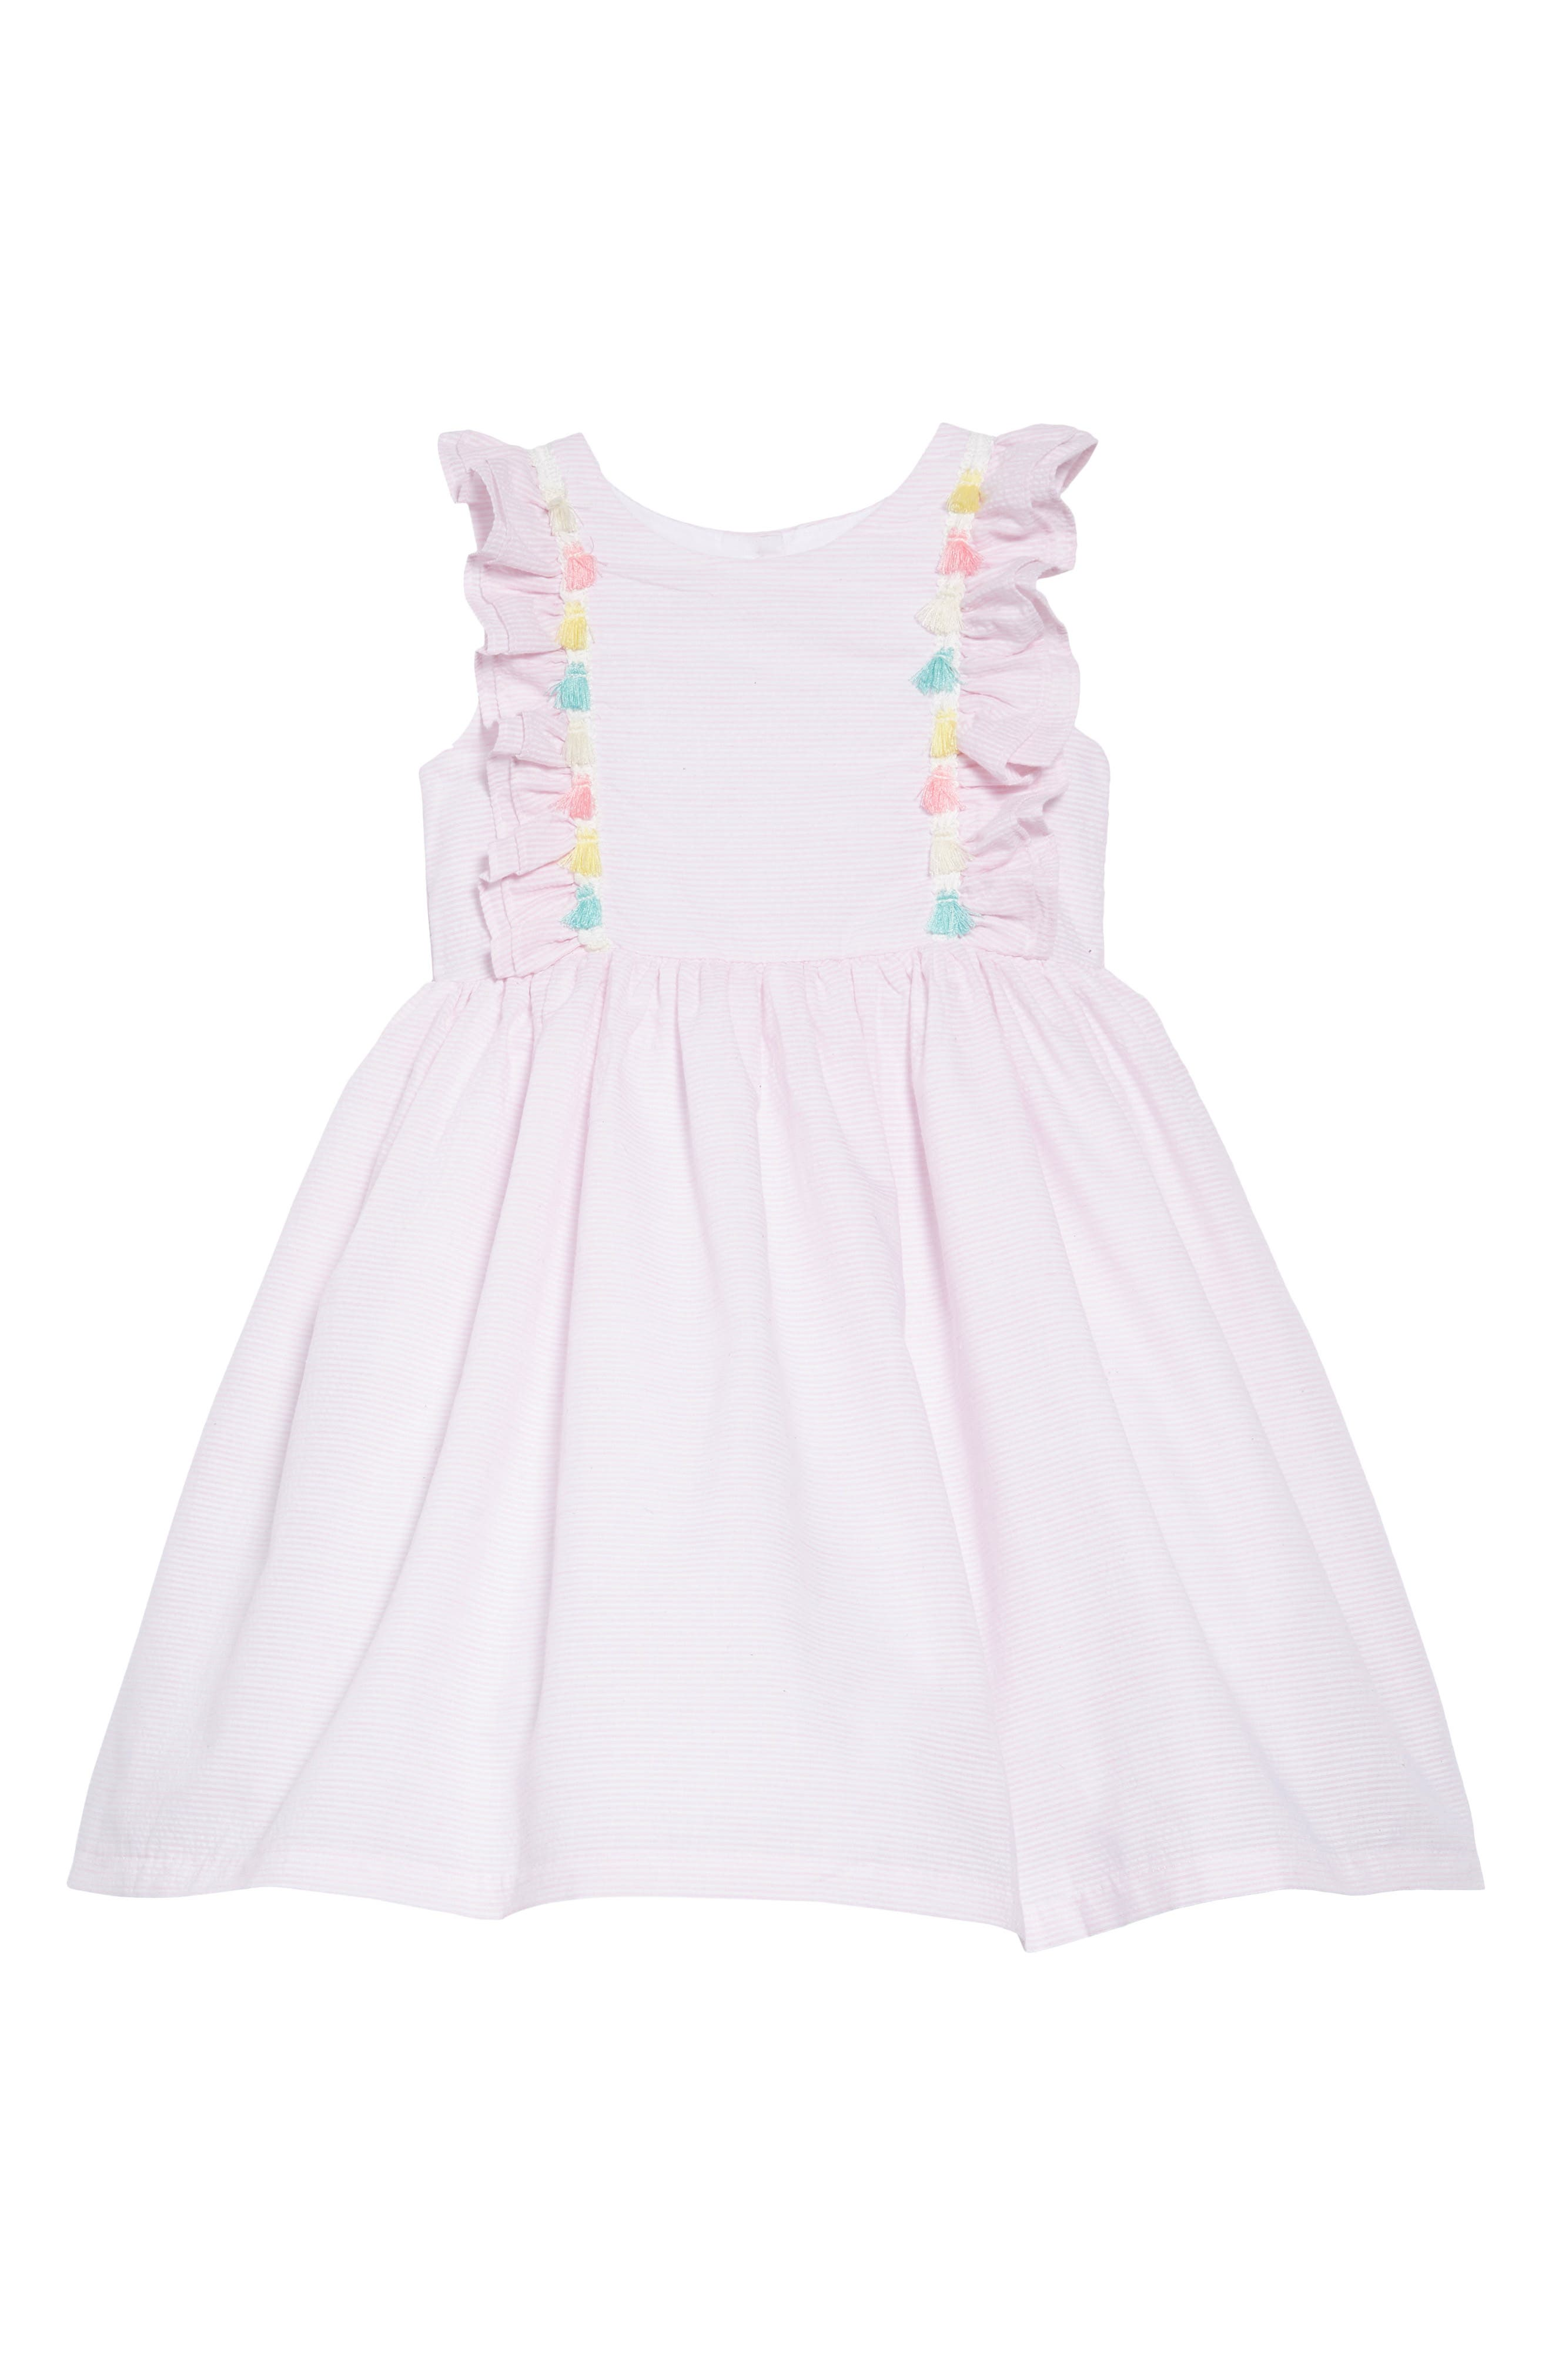 PIPPA & JULIE Tassel Trim Seersucker Dress, Main, color, 650